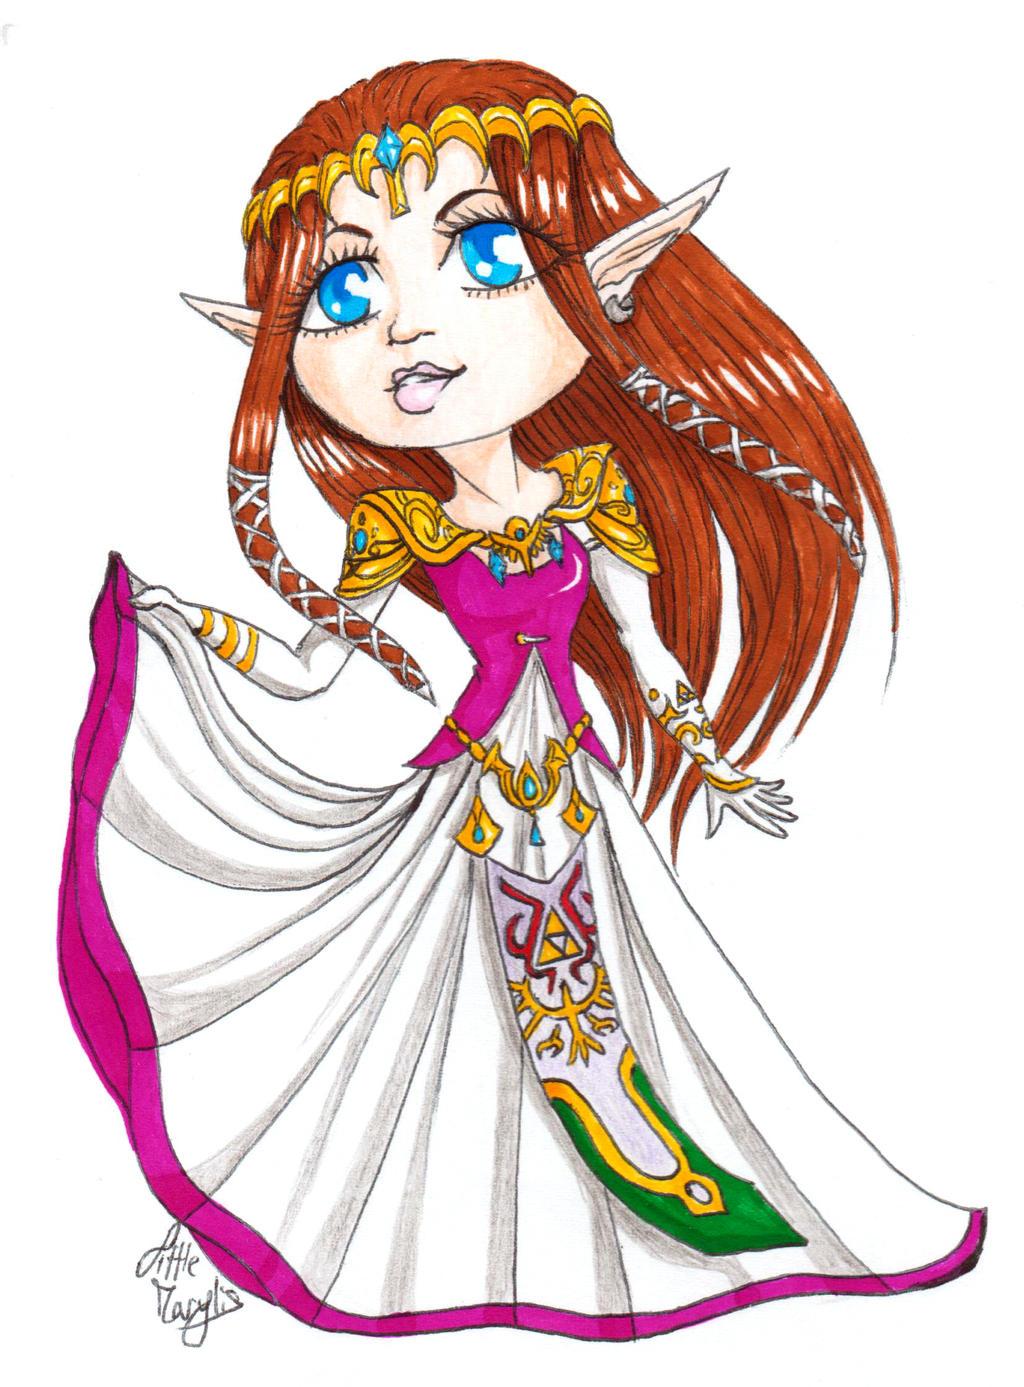 Twilight Zelda - Before The Fall by ALittleLady